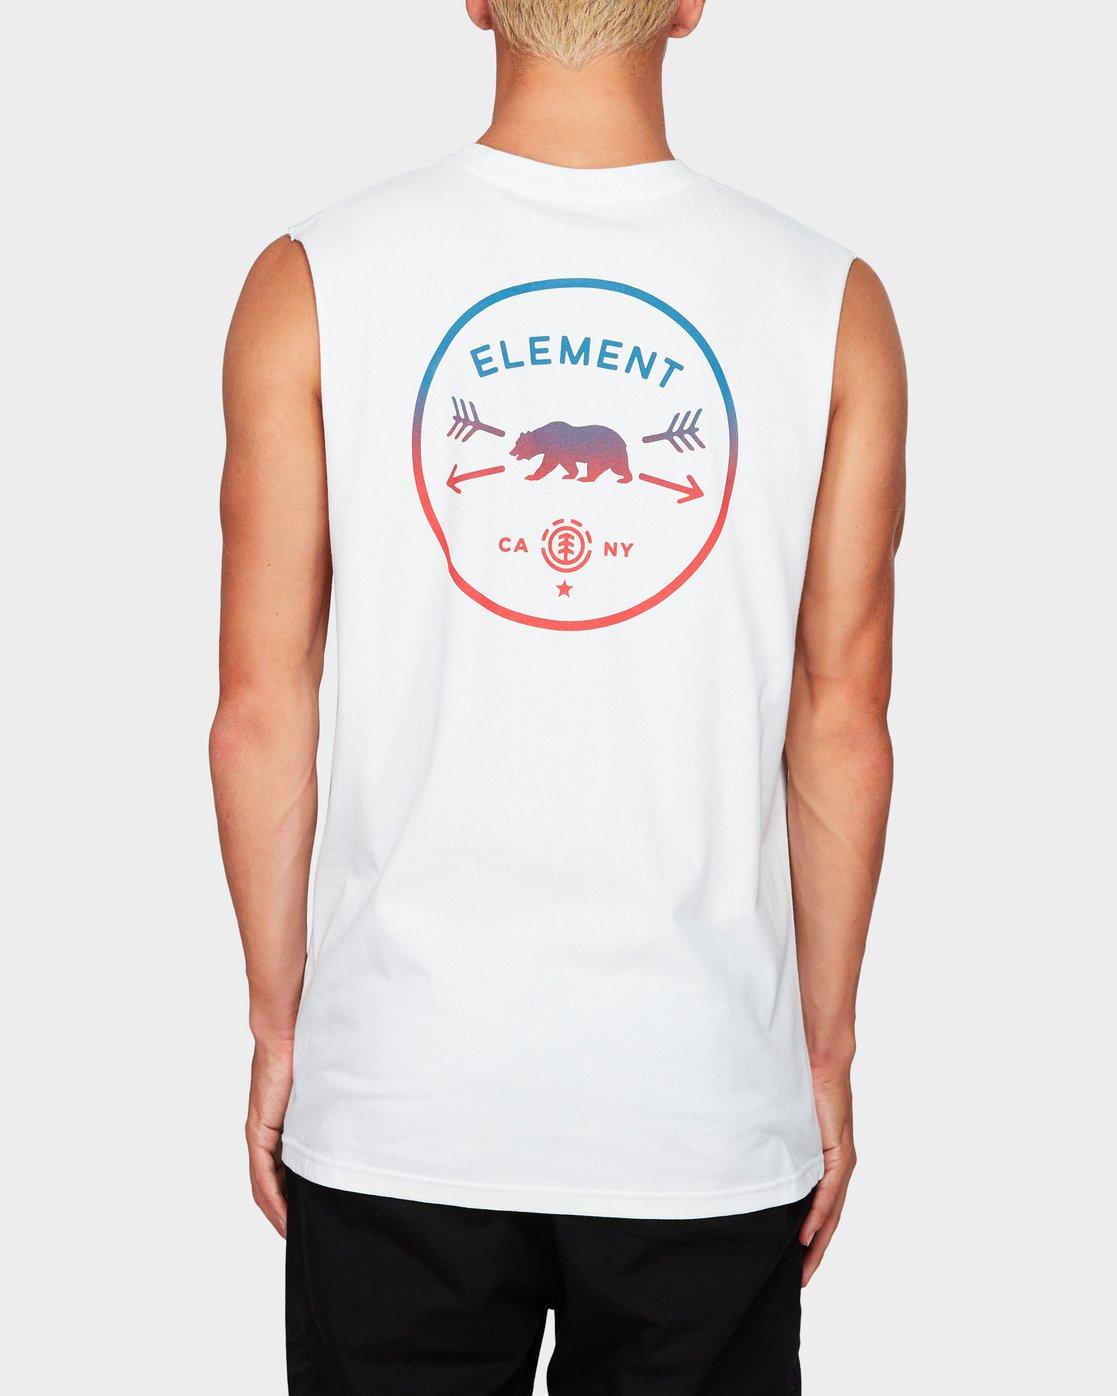 1 ELEMENT ENDURE MU  194271 Element